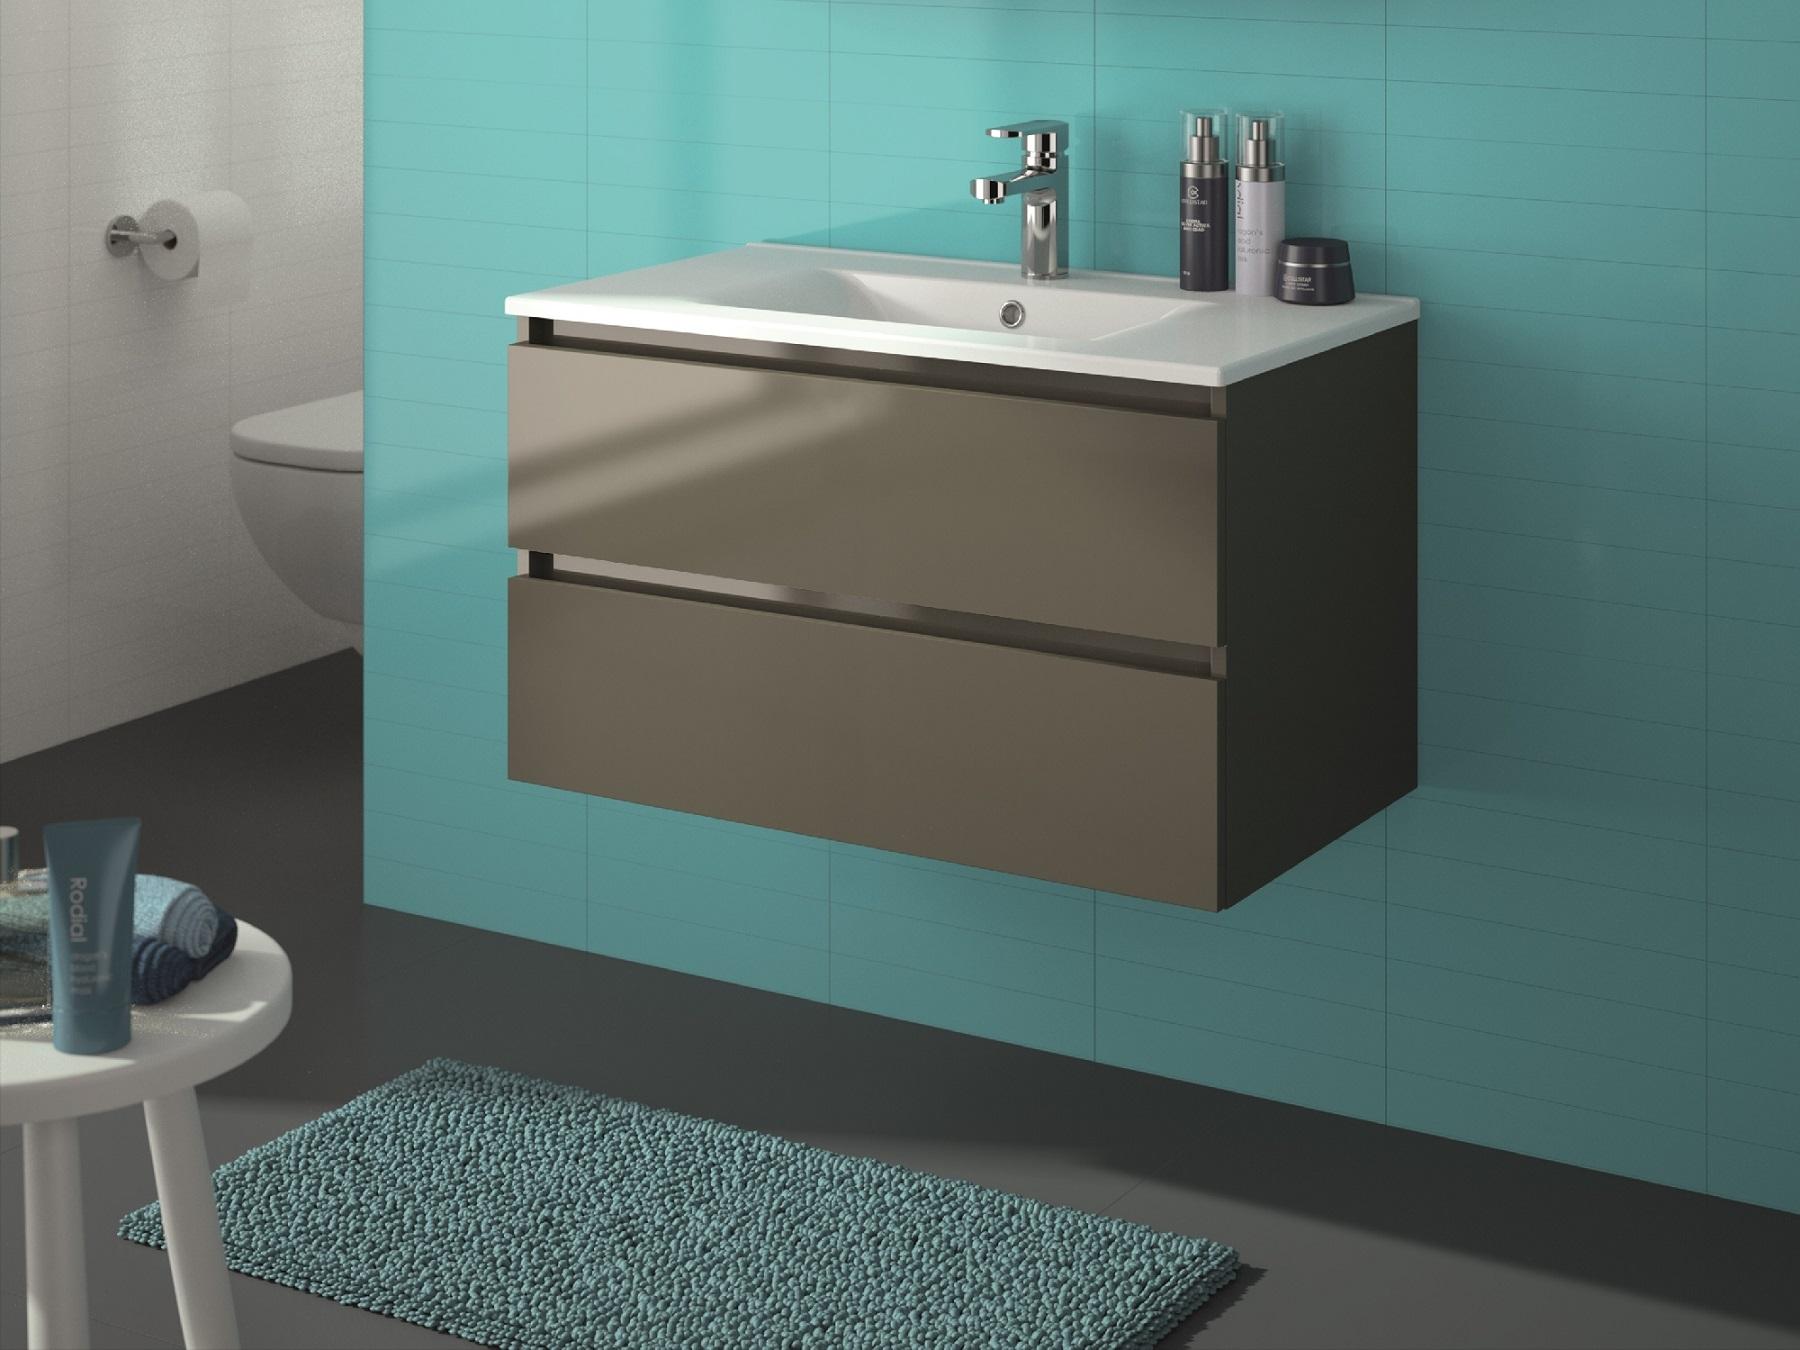 allibert badm bel set badm bel vormontiert grau glanz softclose waschtisch 80 cm ebay. Black Bedroom Furniture Sets. Home Design Ideas